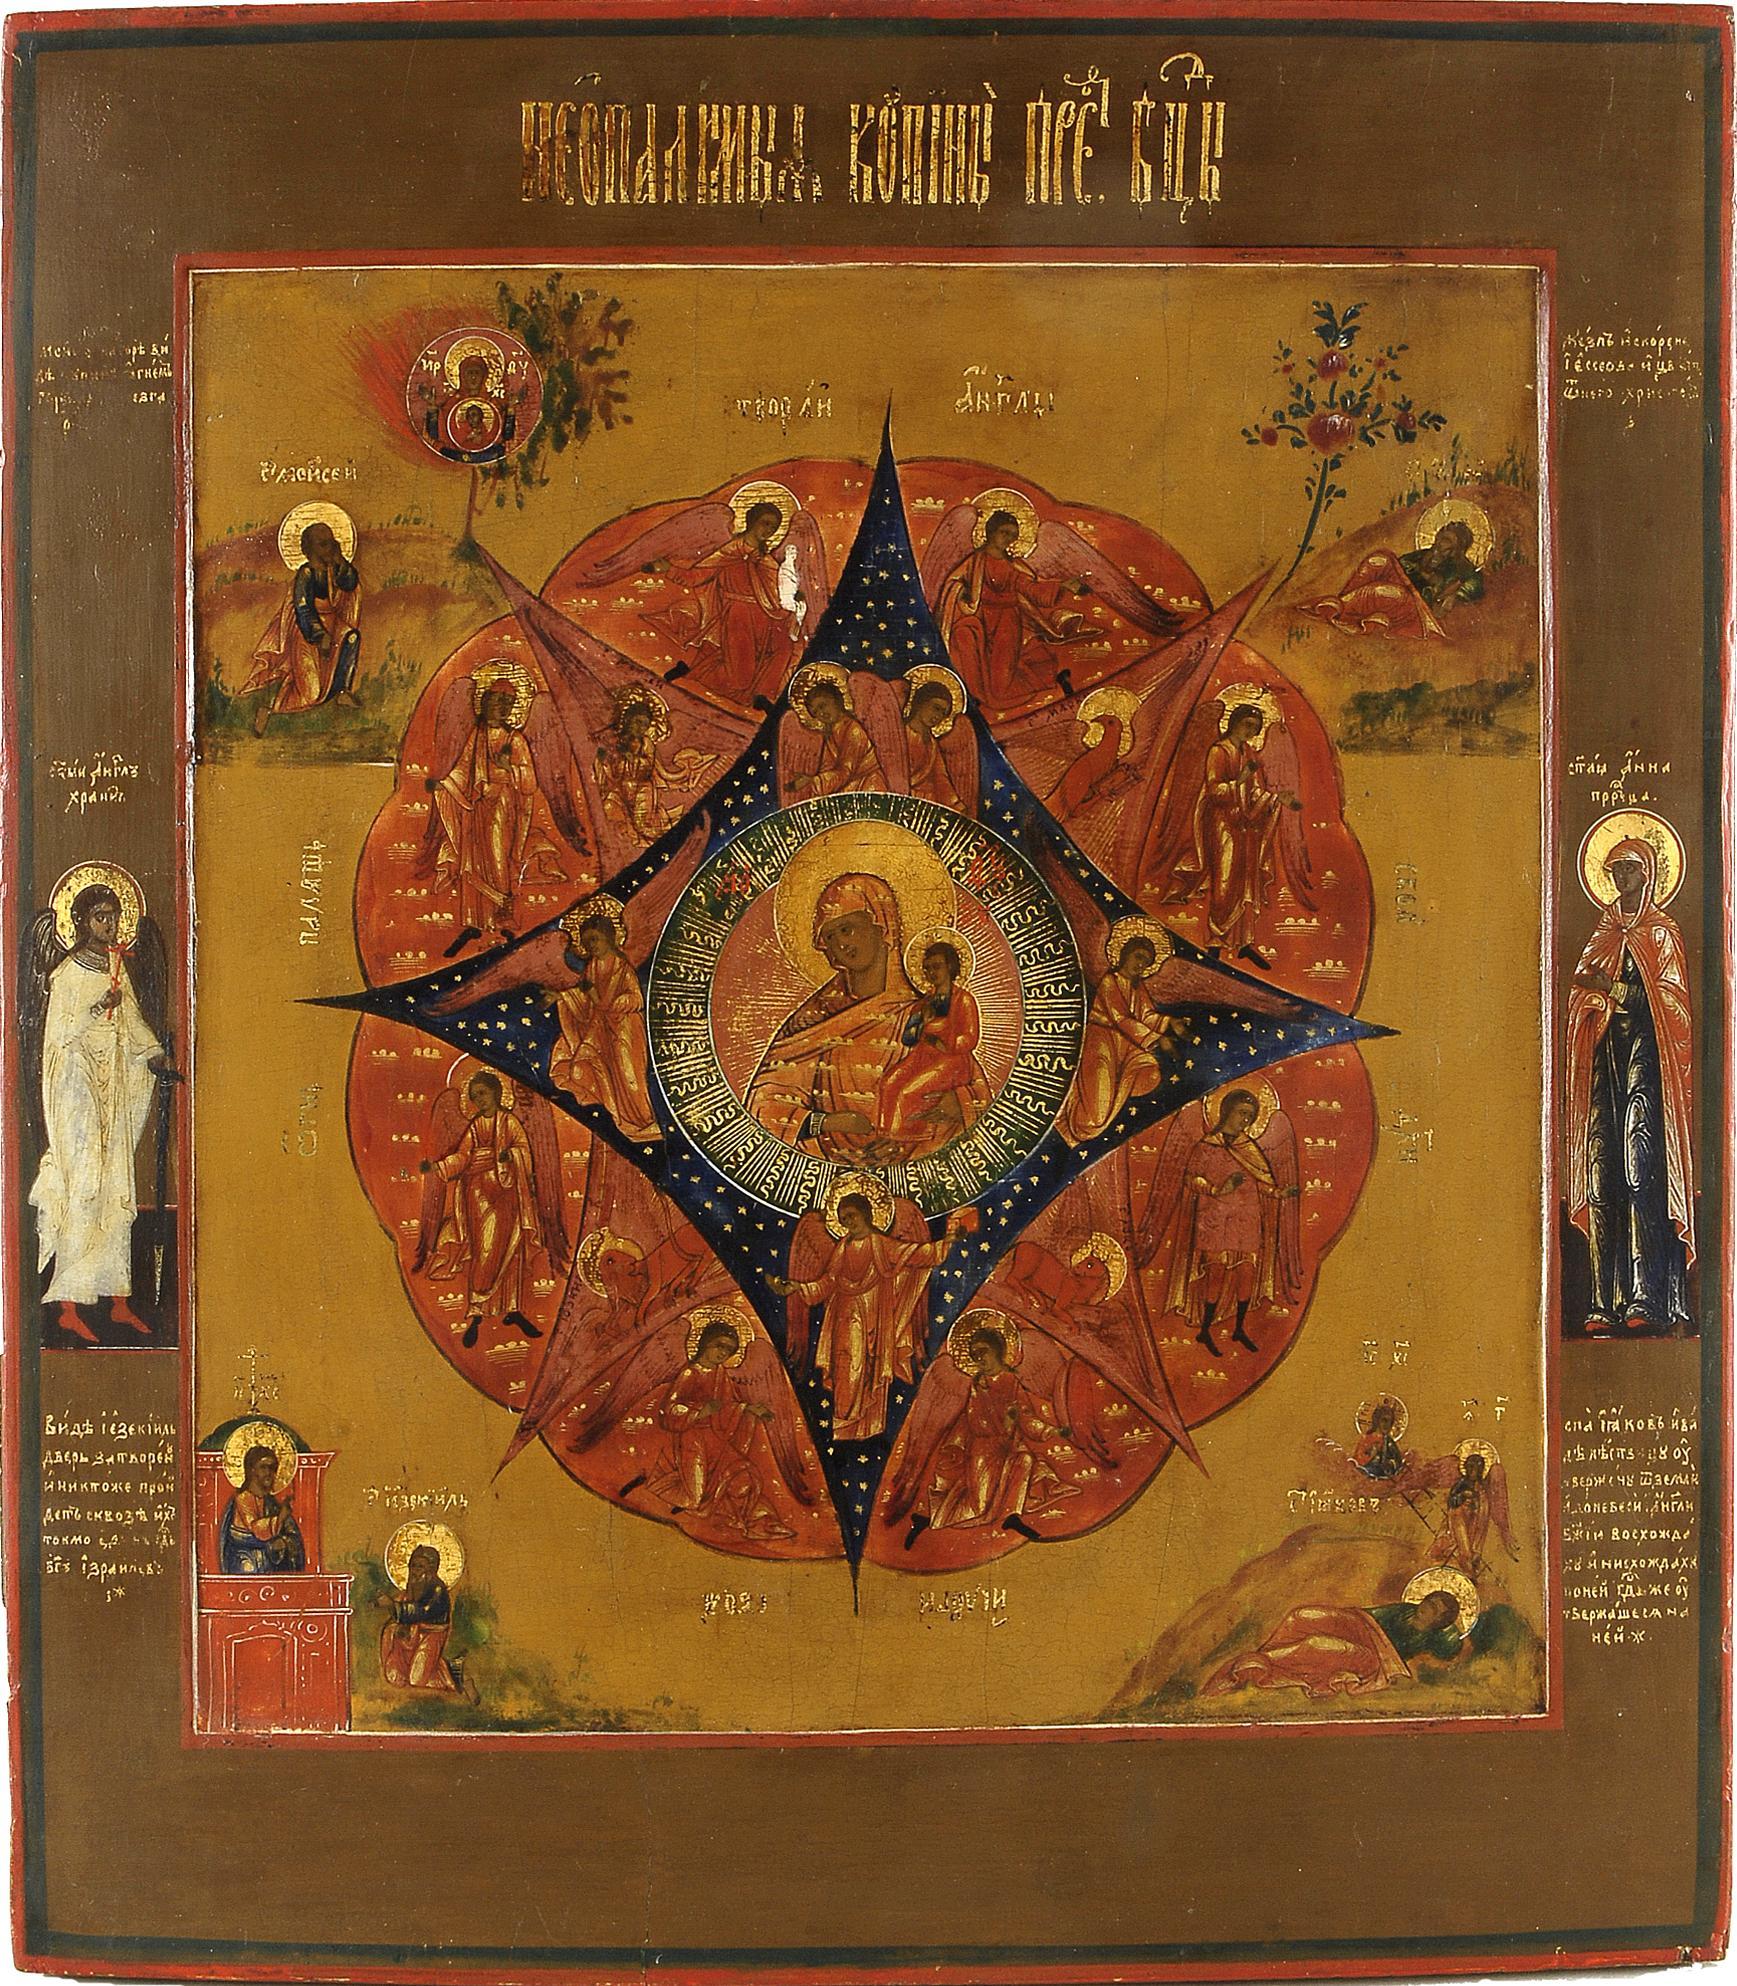 неопалимая купина икона божией матери ...: pictures11.ru/neopalimaya-kupina-ikona-bozhiej-materi.html